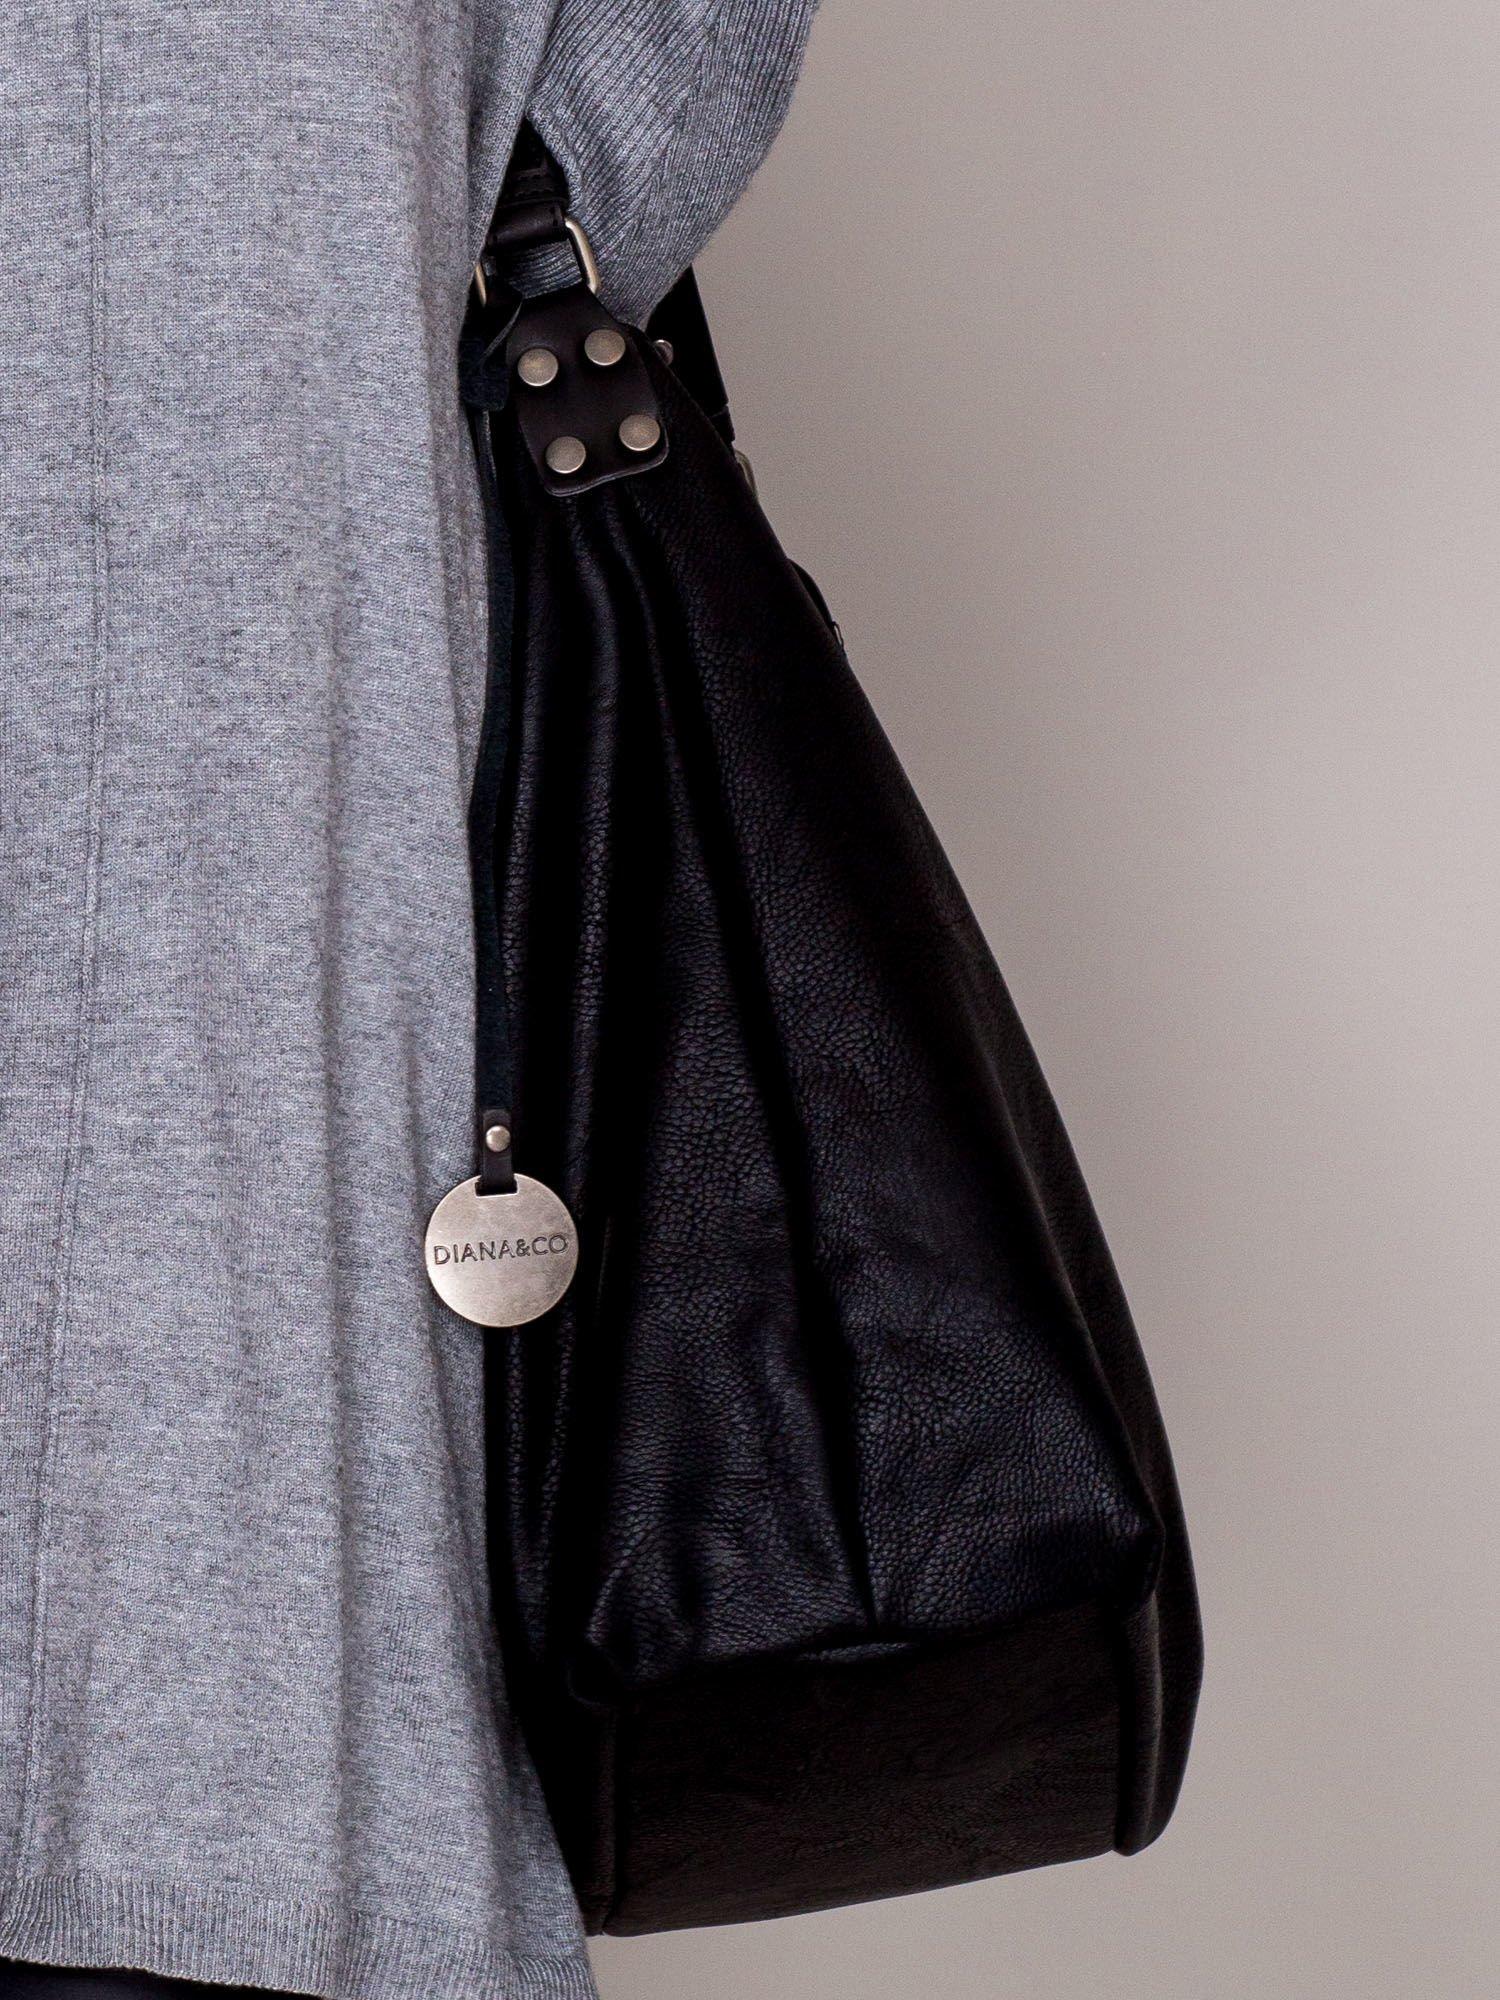 3e2bbf4f8ac14 Super Duża torba shopper na suwak czarna - Akcesoria torba - sklep  eButik.pl